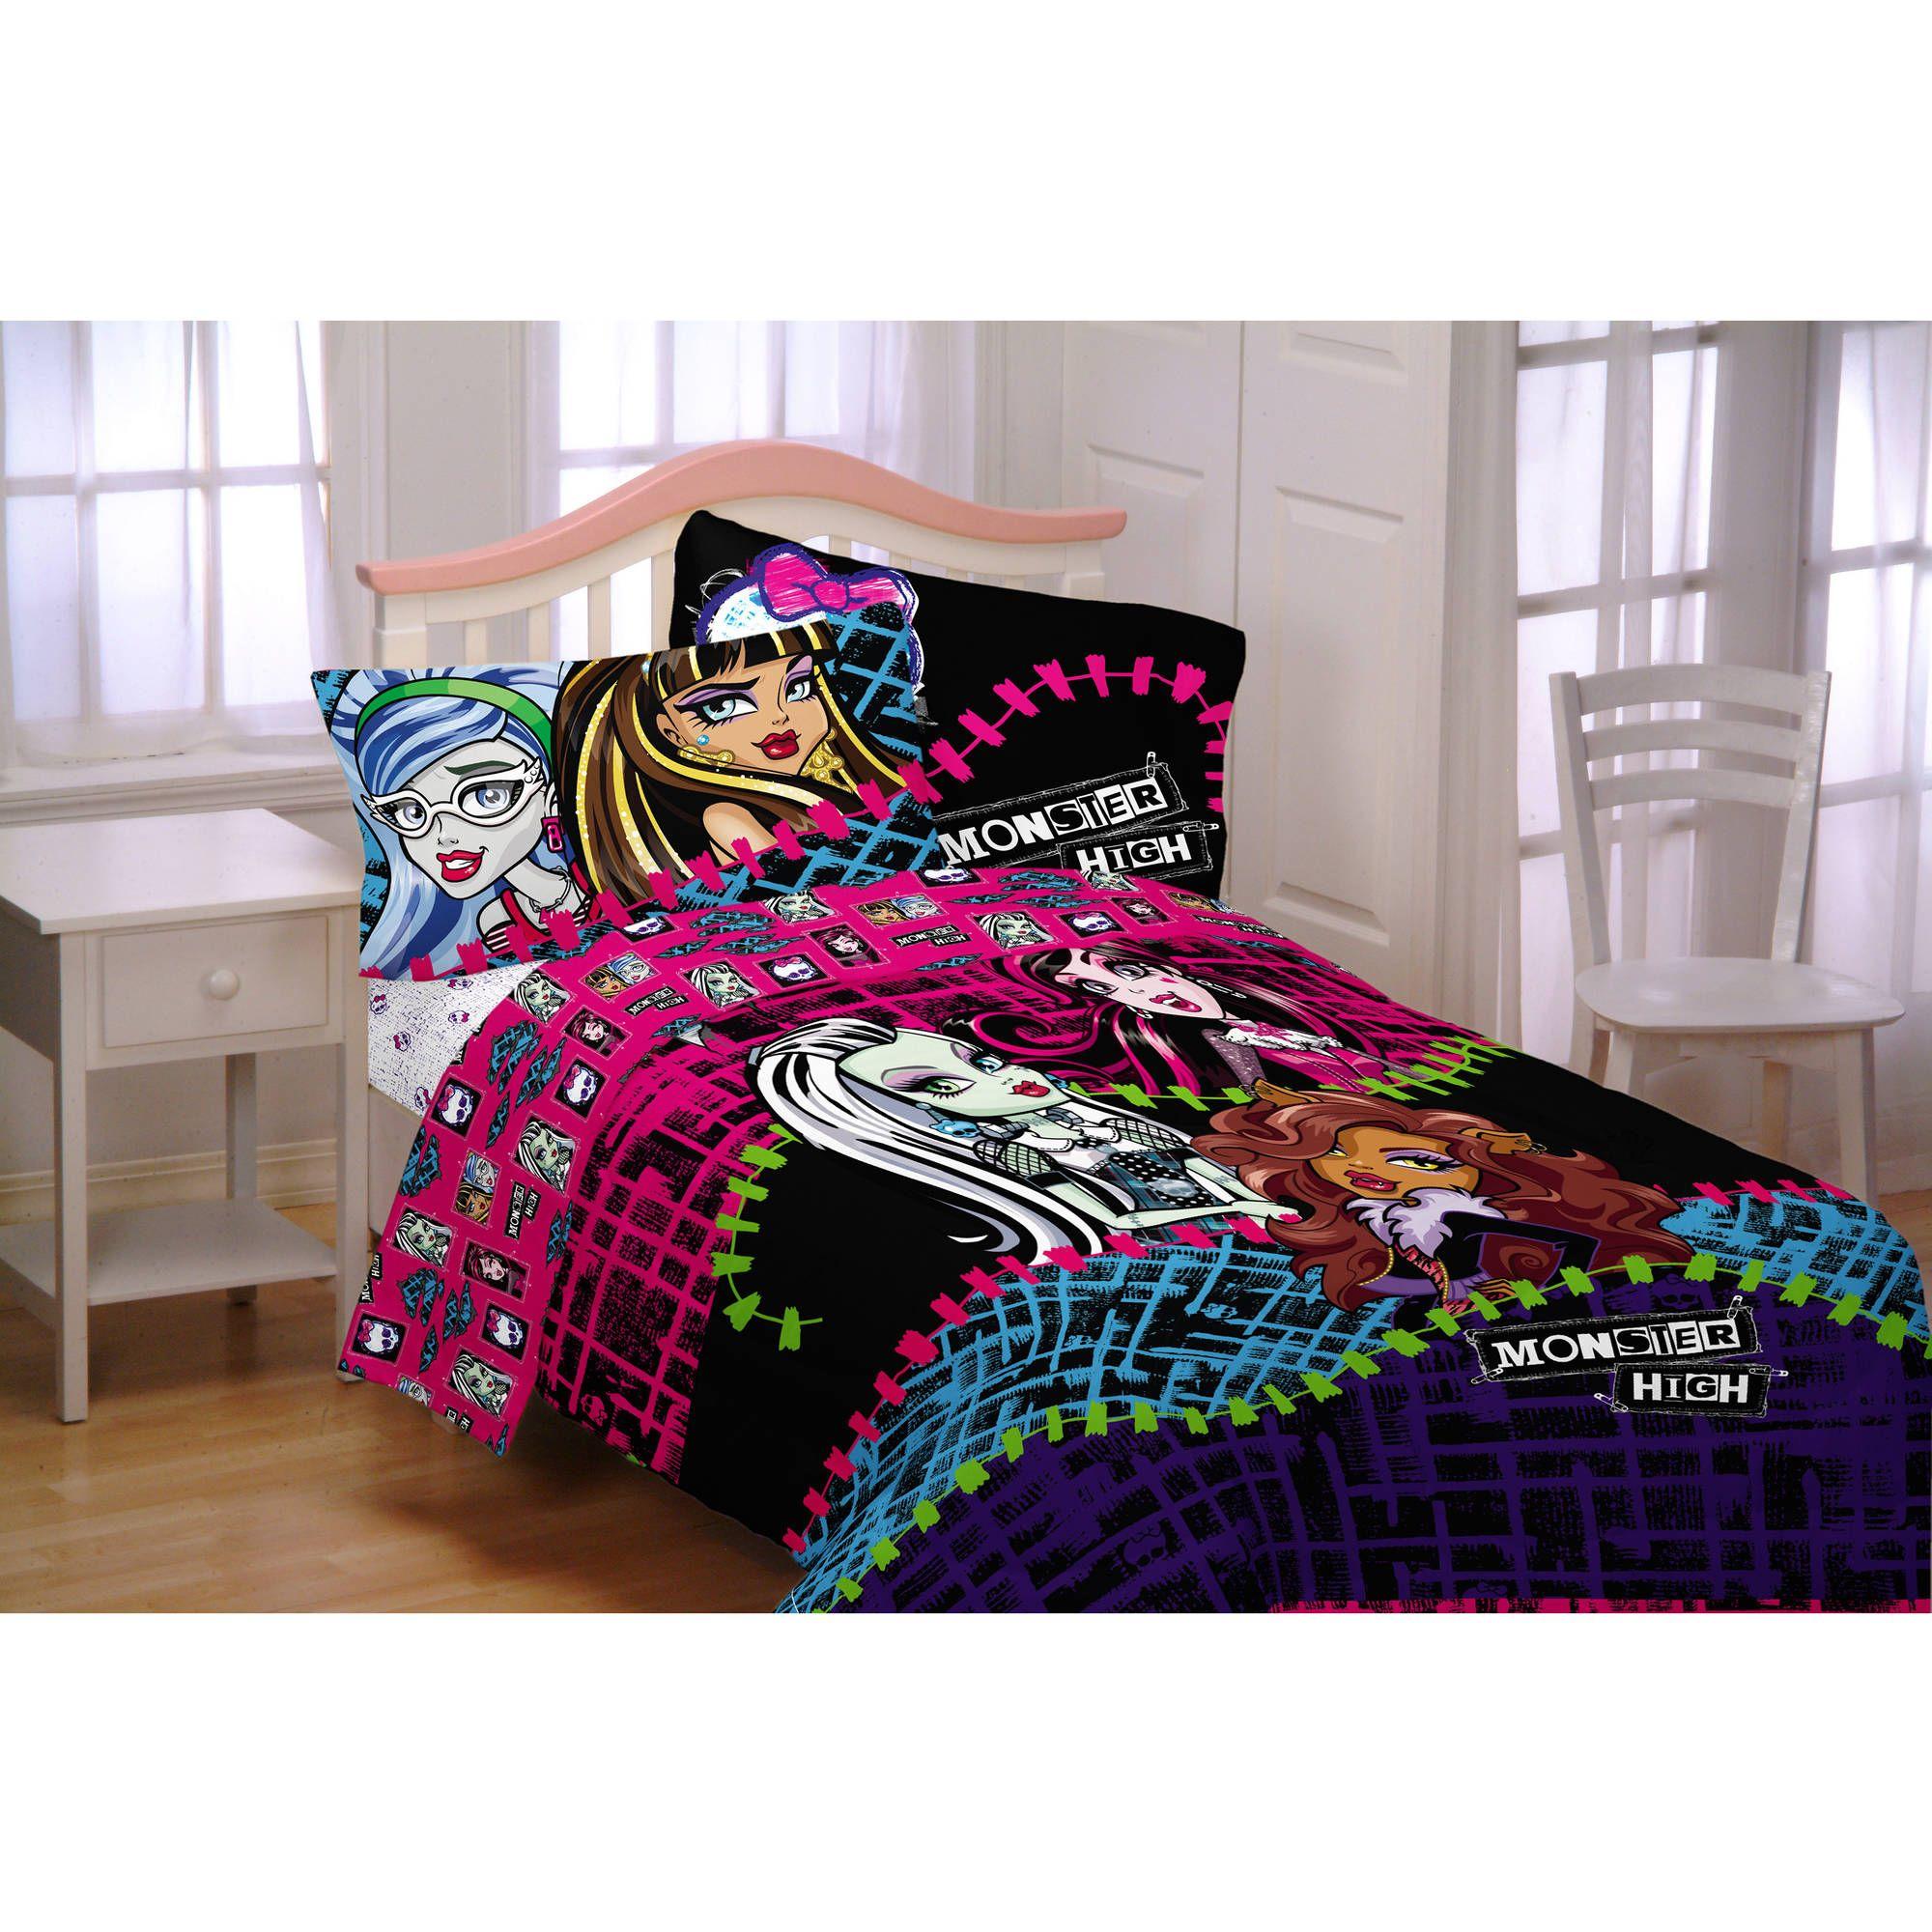 Monster High All Ghouls Allowed Twin Full Microfiber Reversible Bedding Comforter Walmart Com Twin Size Bedding Full Bedding Sets Kids Twin Bedding Sets